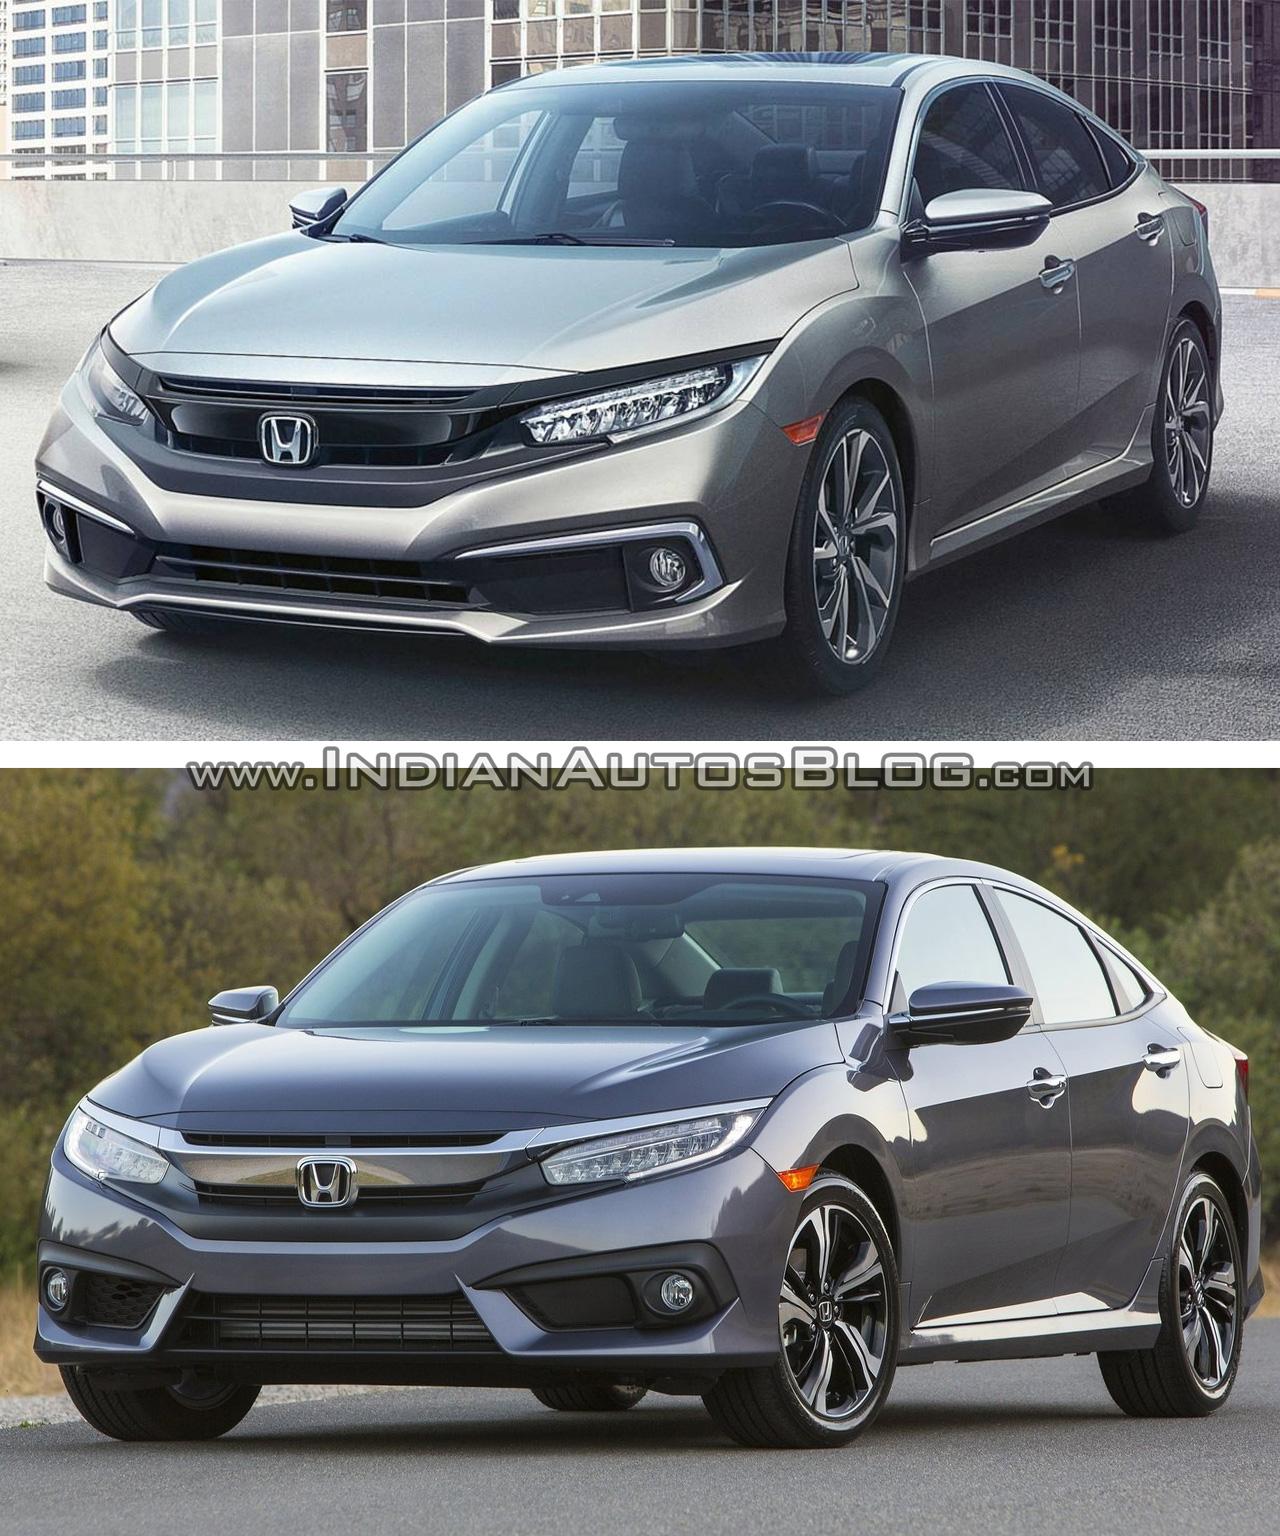 2019 Honda Civic Sedan Front Splitter: 2019 Honda Civic Vs. 2016 Honda Civic